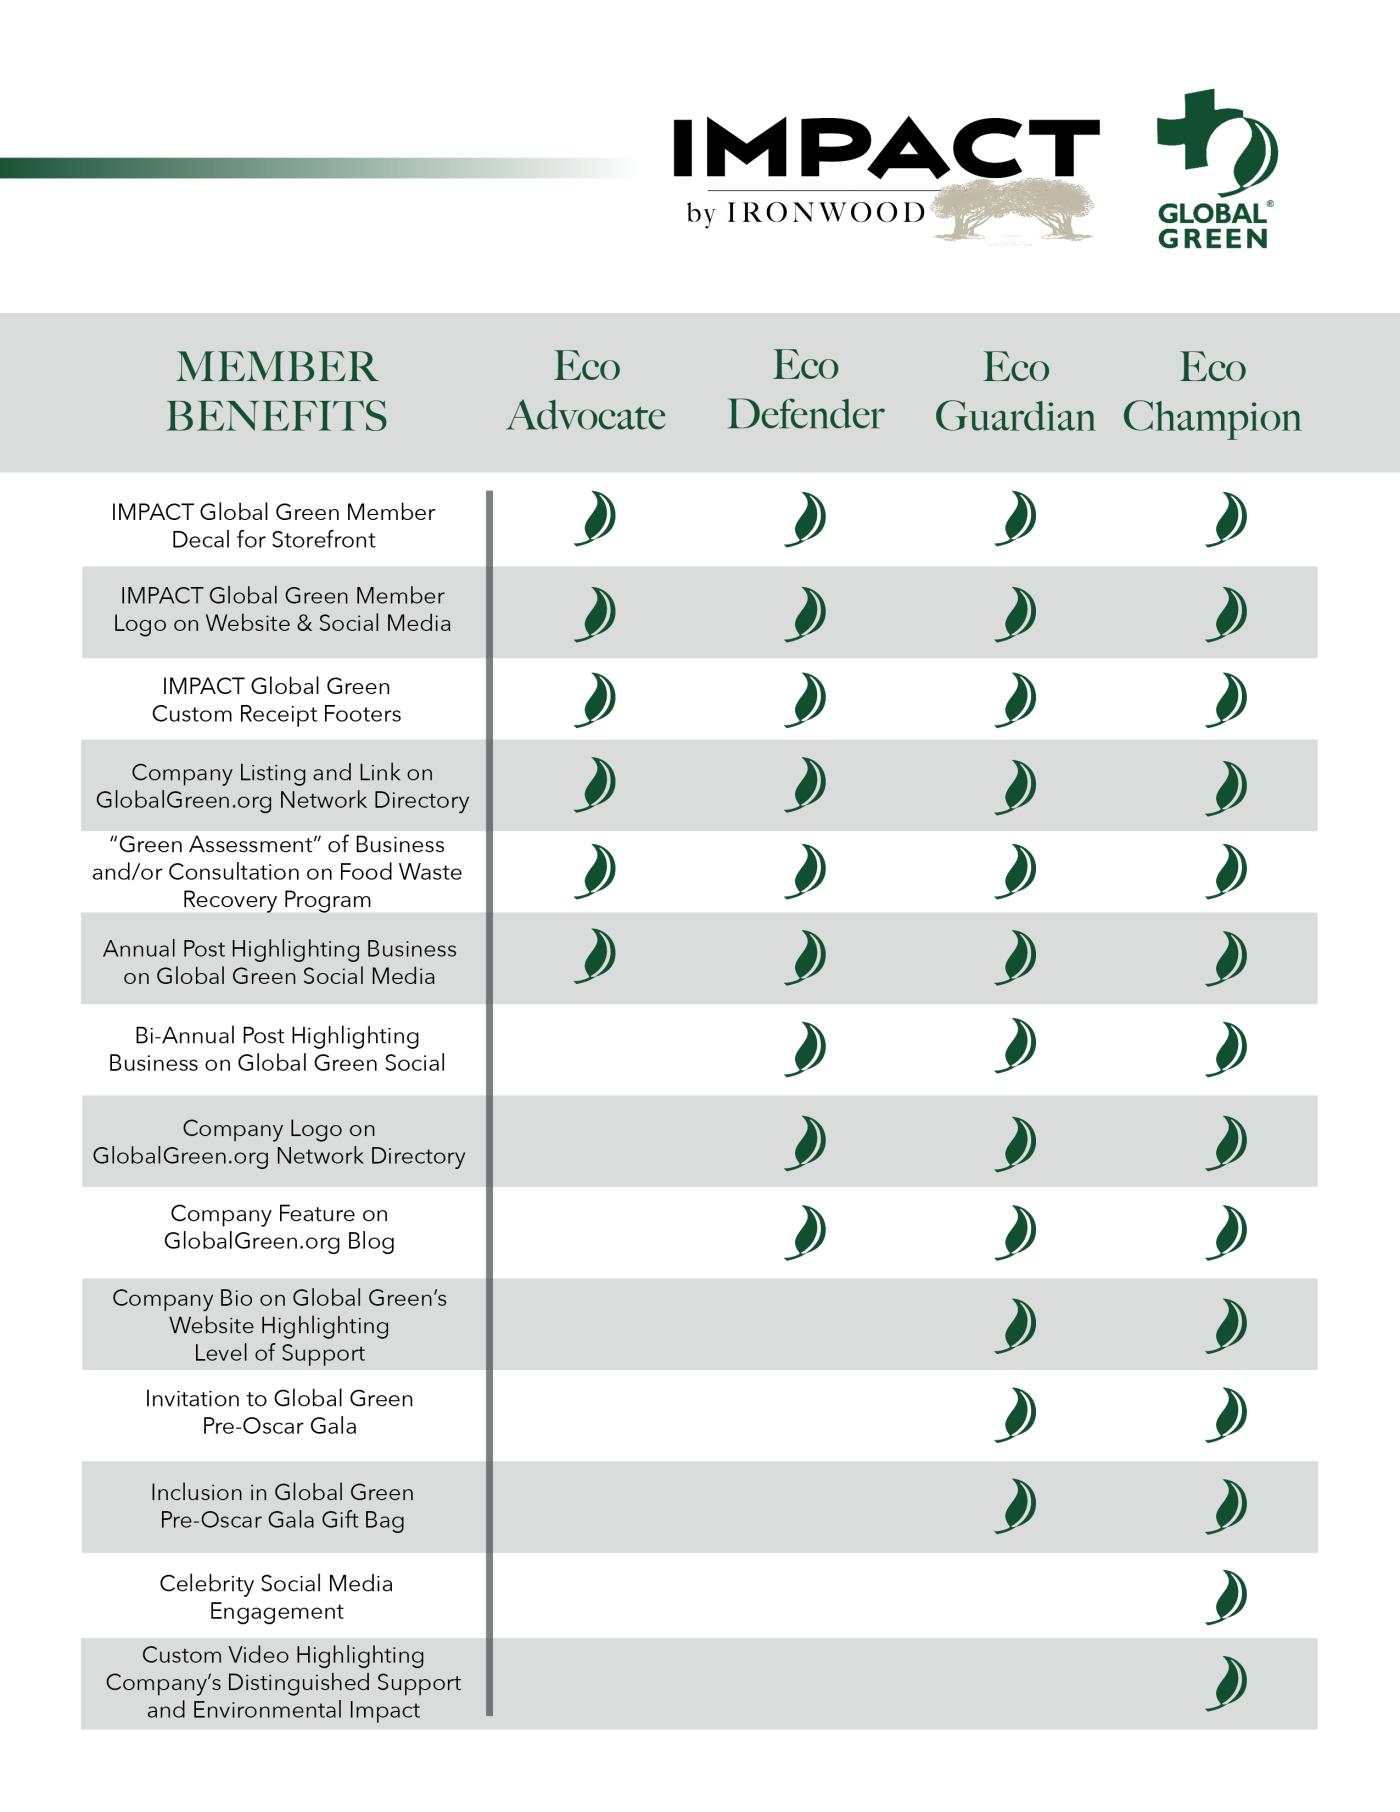 impact-global-green-member-benefits.jpg